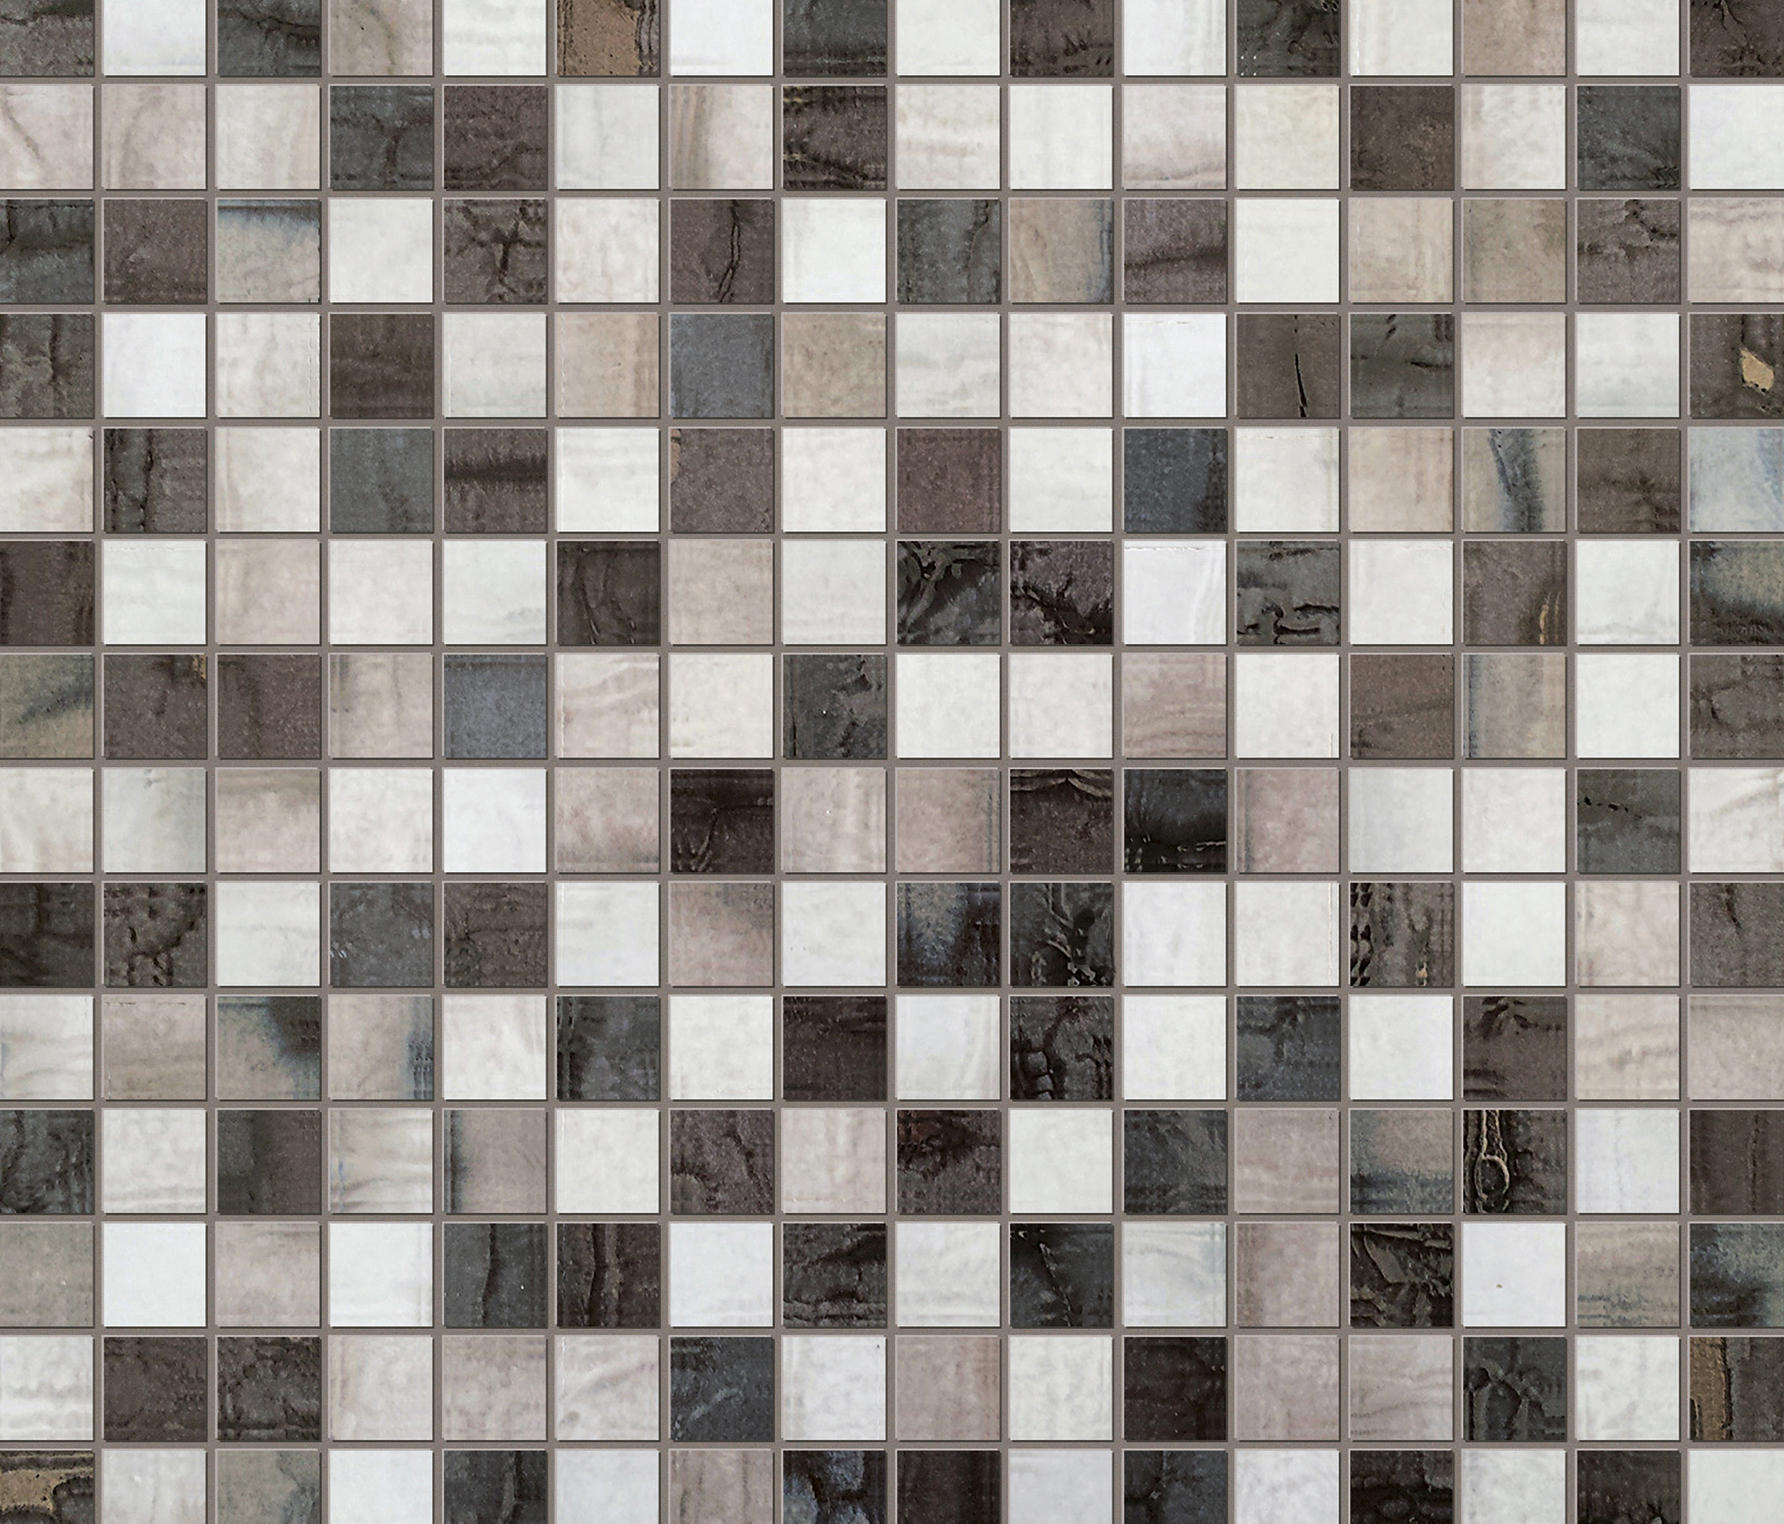 creta madreperla mosaico ceramic mosaics from fap. Black Bedroom Furniture Sets. Home Design Ideas